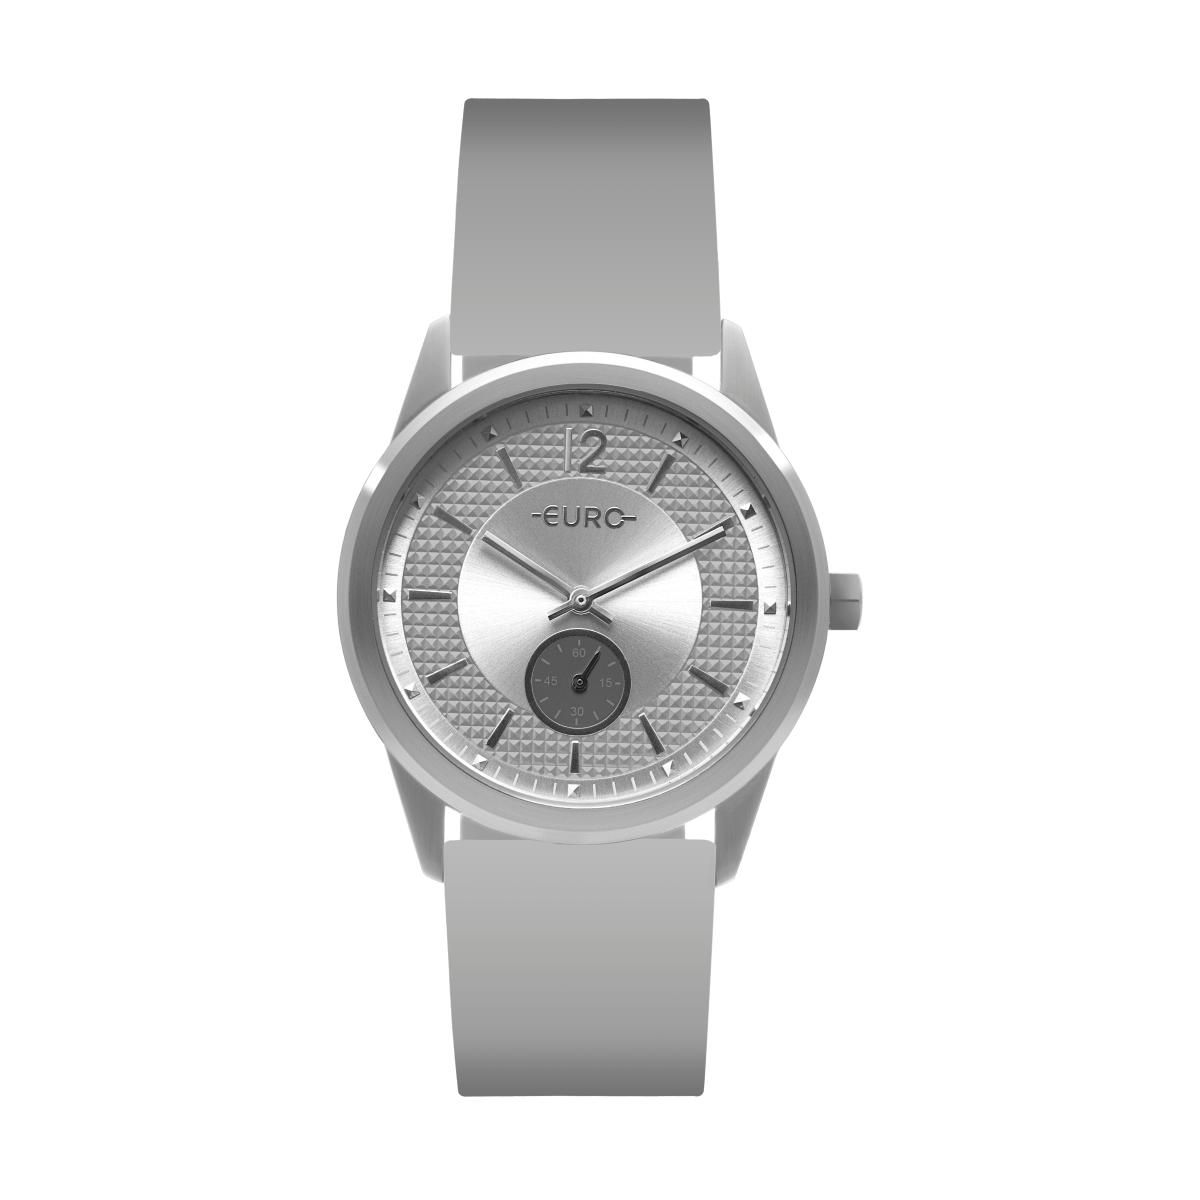 effc4d34307 Relógio Feminino Euro EU1L45AA 8K 40mm Silicone Cinza